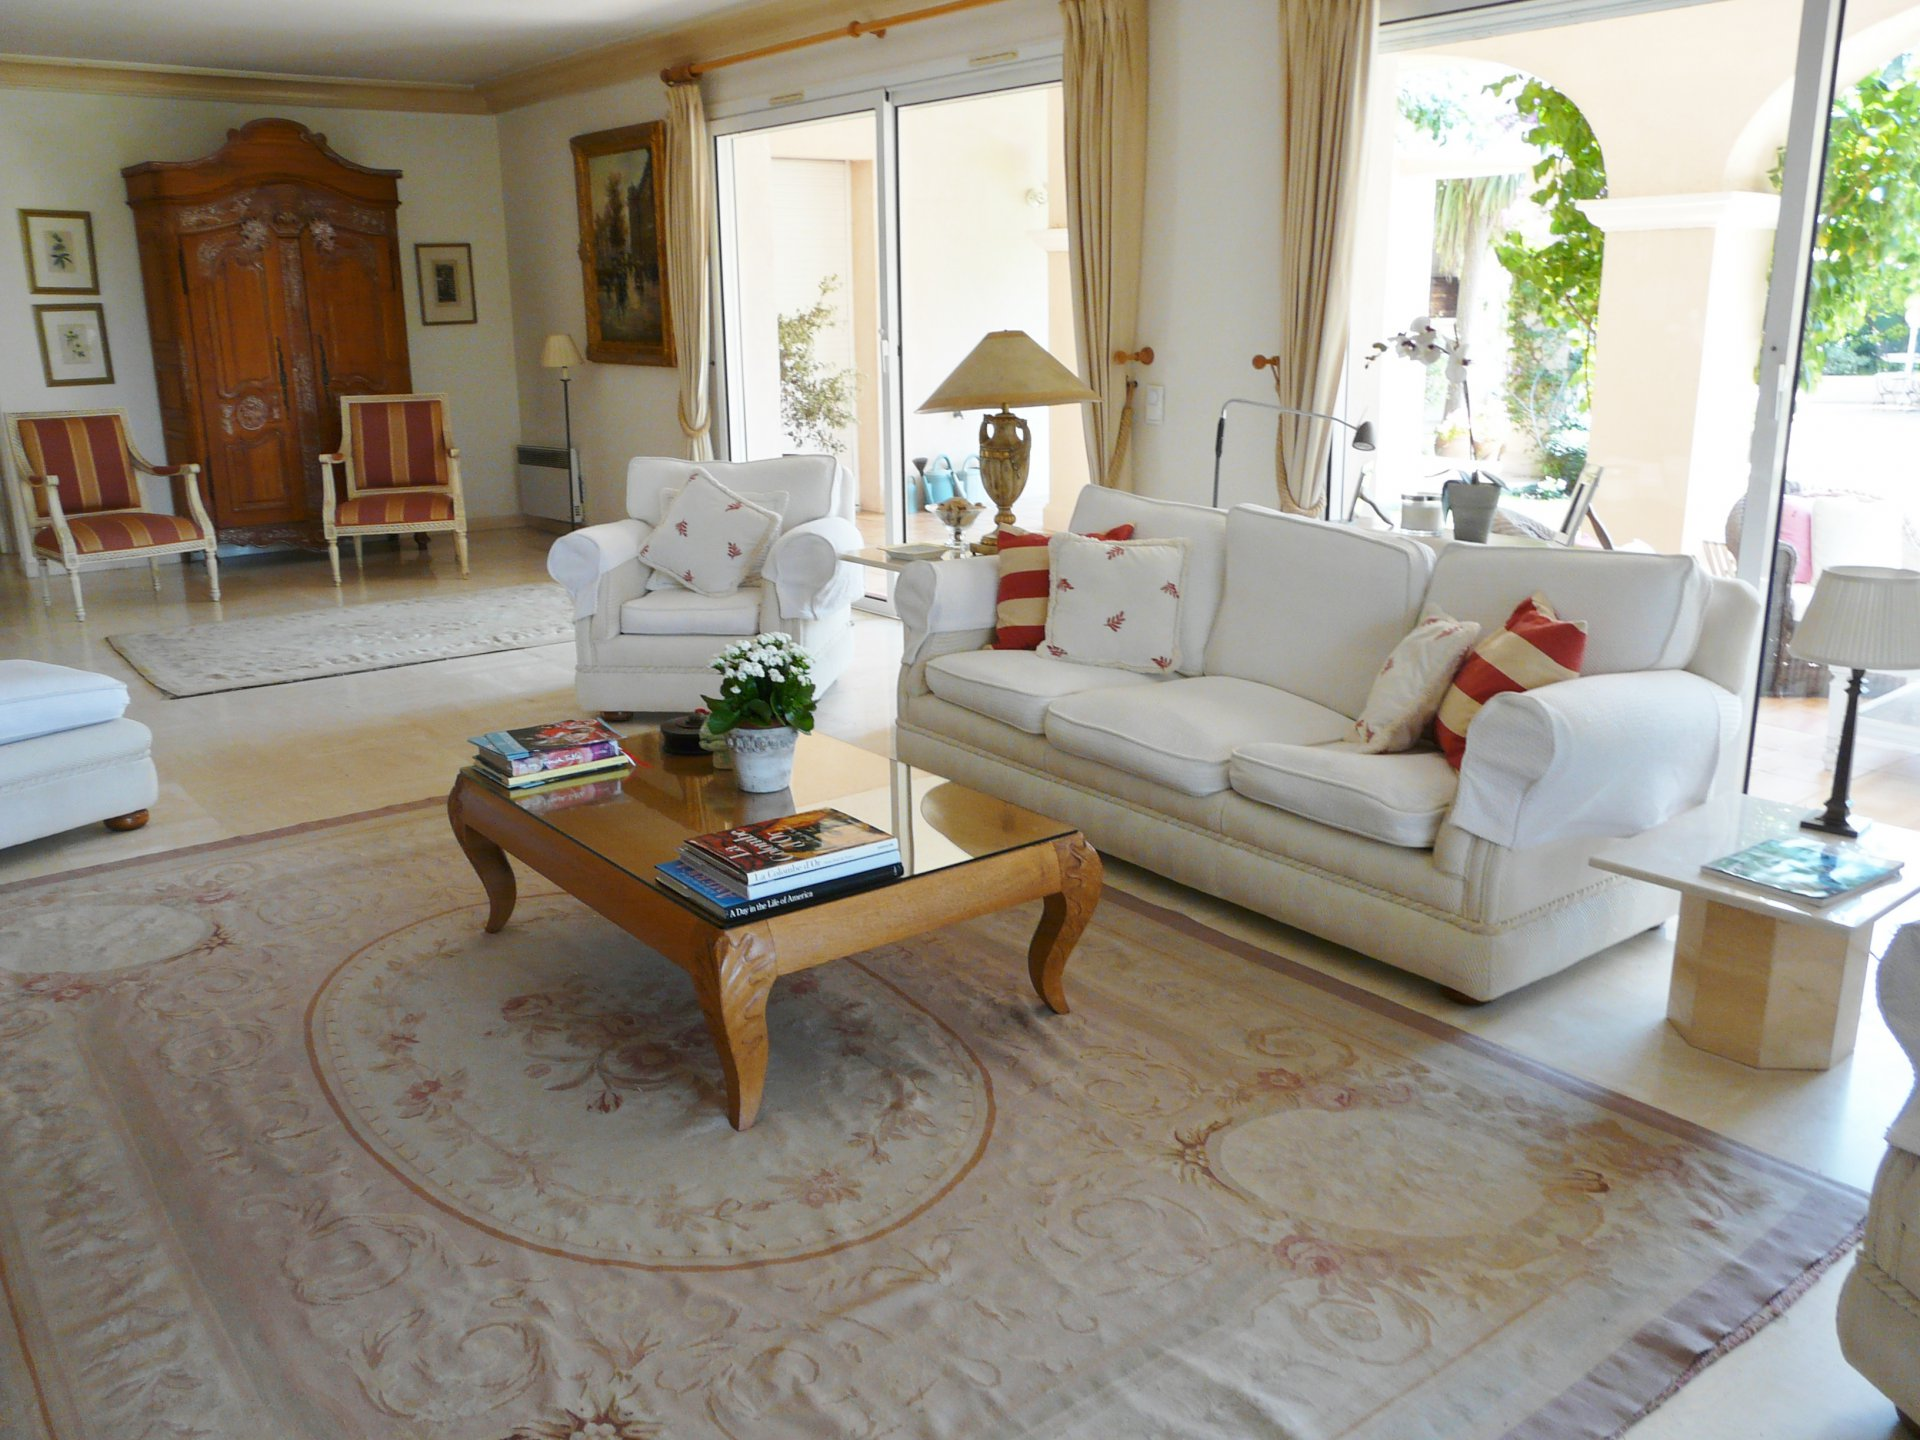 Living-room, natural light